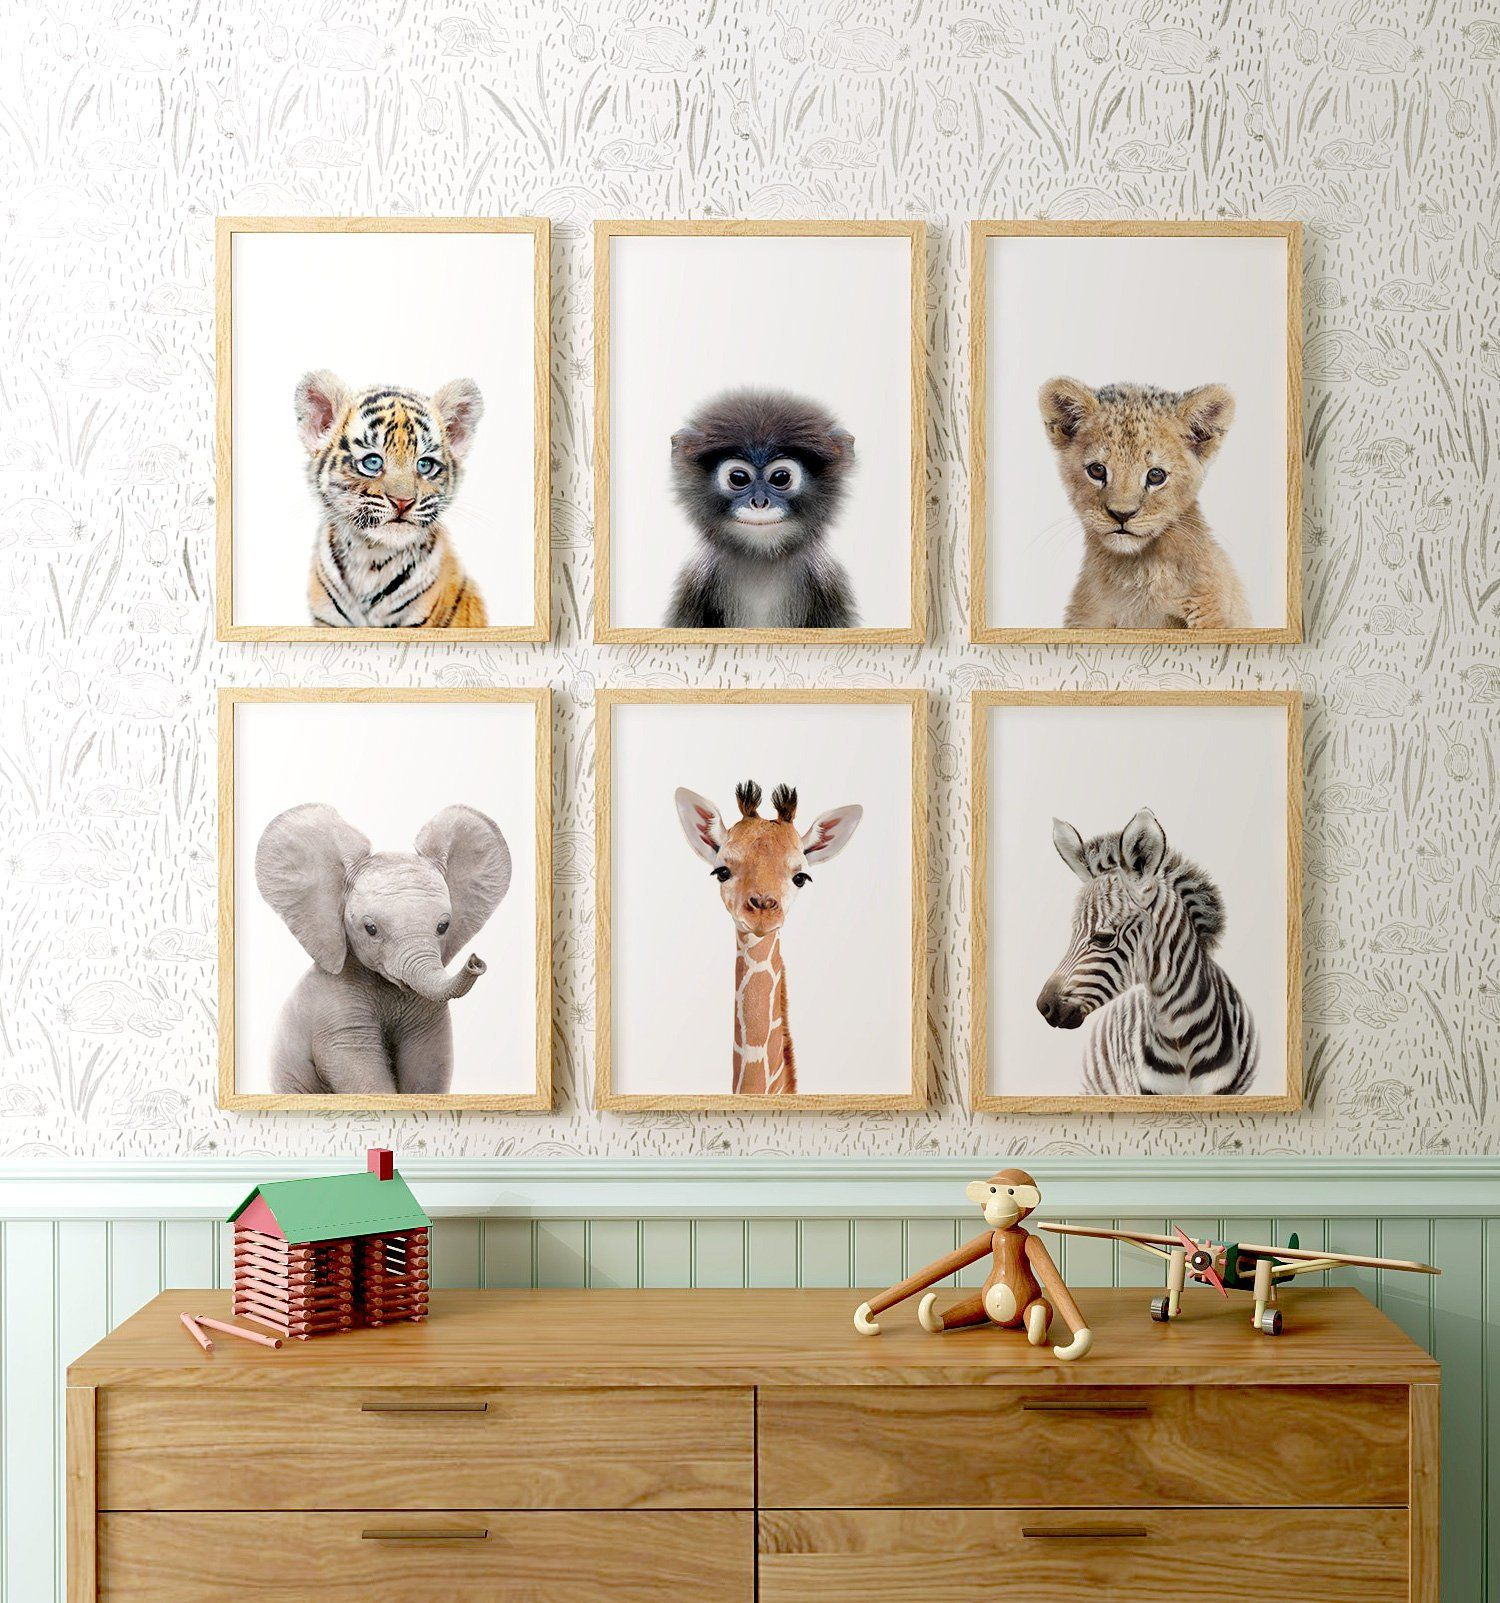 Safari Nursery Decor Printable Art Safari Animal Prints Etsy Nursery Animal Prints Safari Nursery Decor Safari Animal Prints Nursery